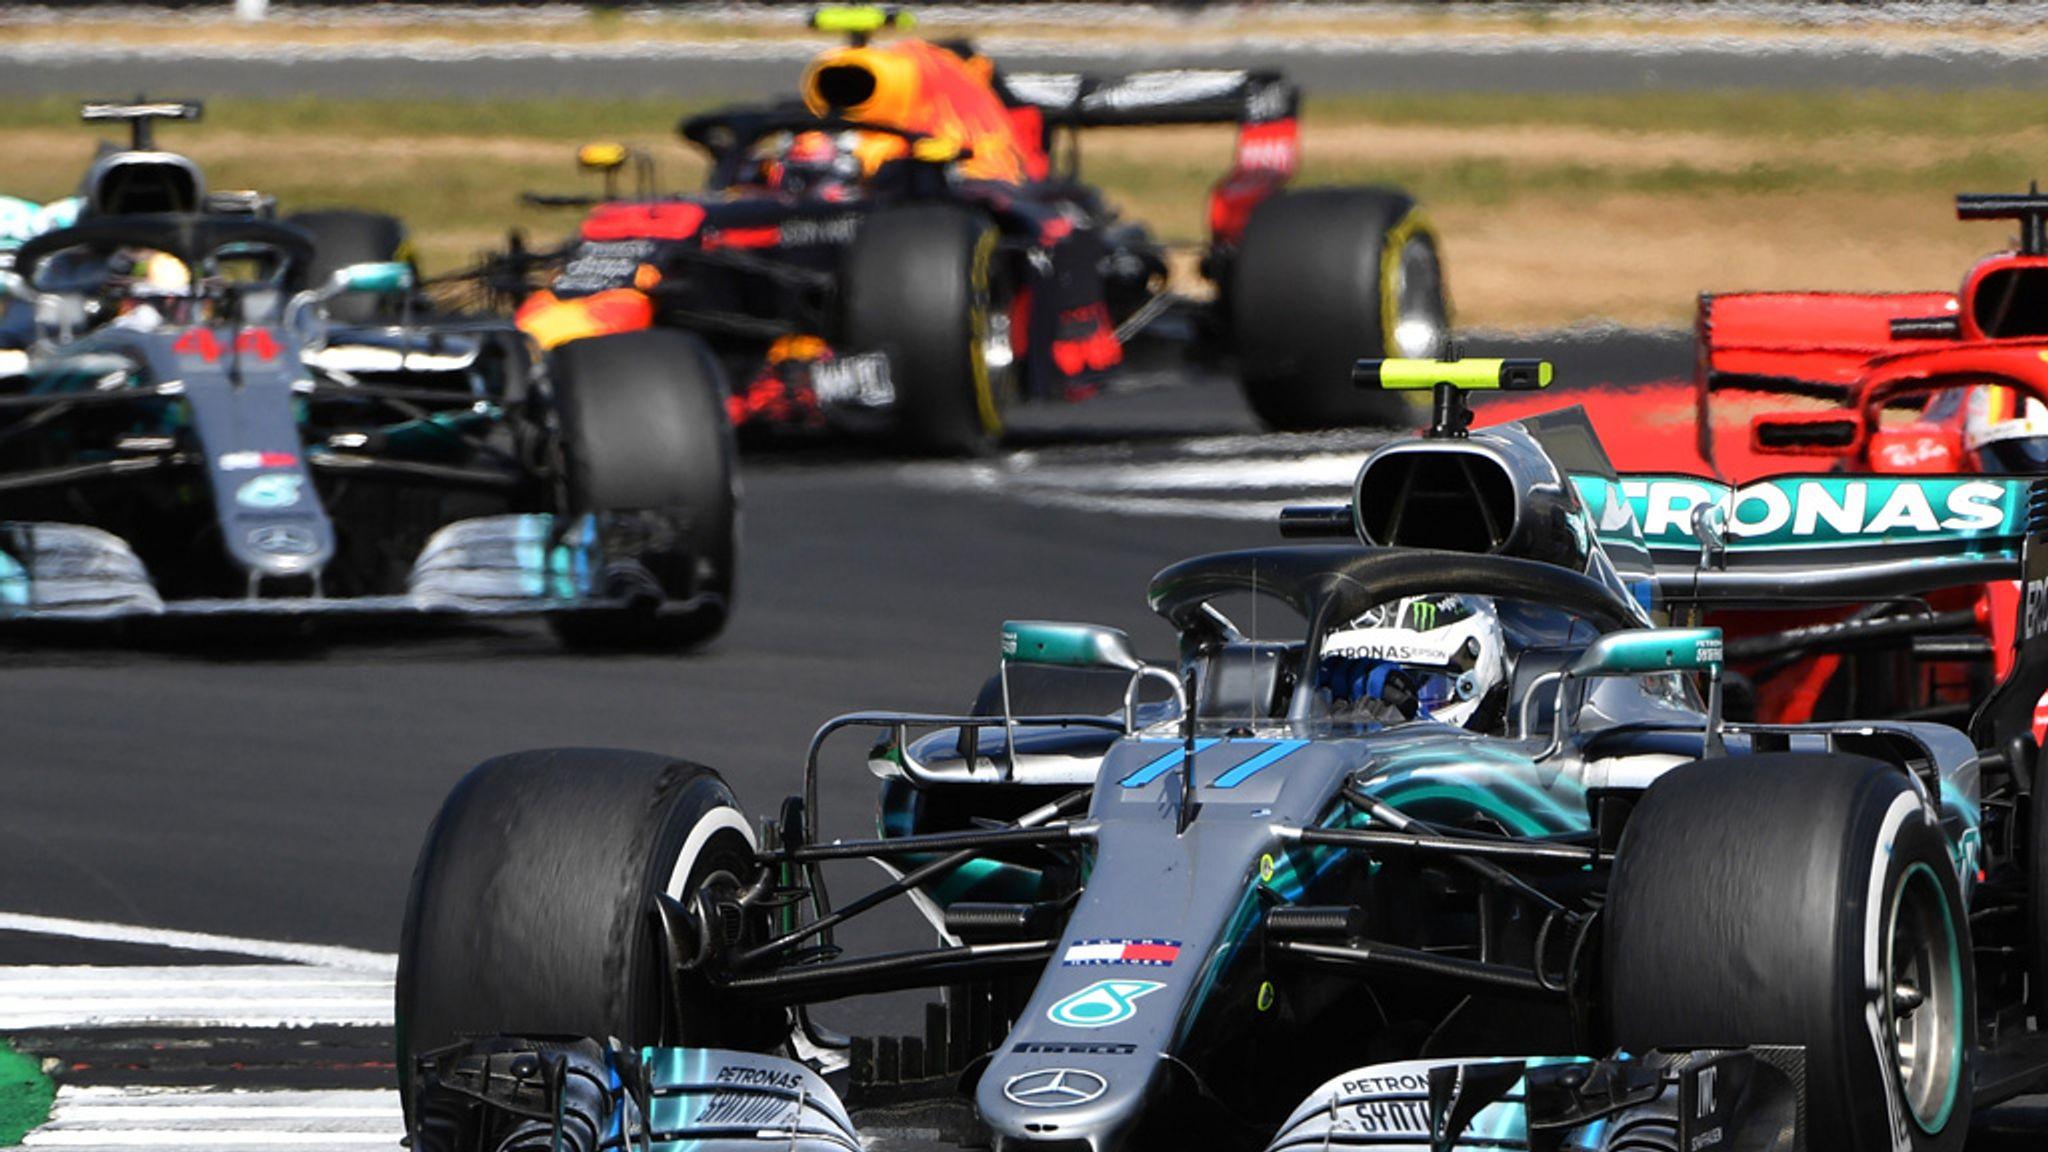 Calendario Di F1 2020.Vietnam Gp To Be Hosted In Hanoi From 2020 F1 Season F1 News